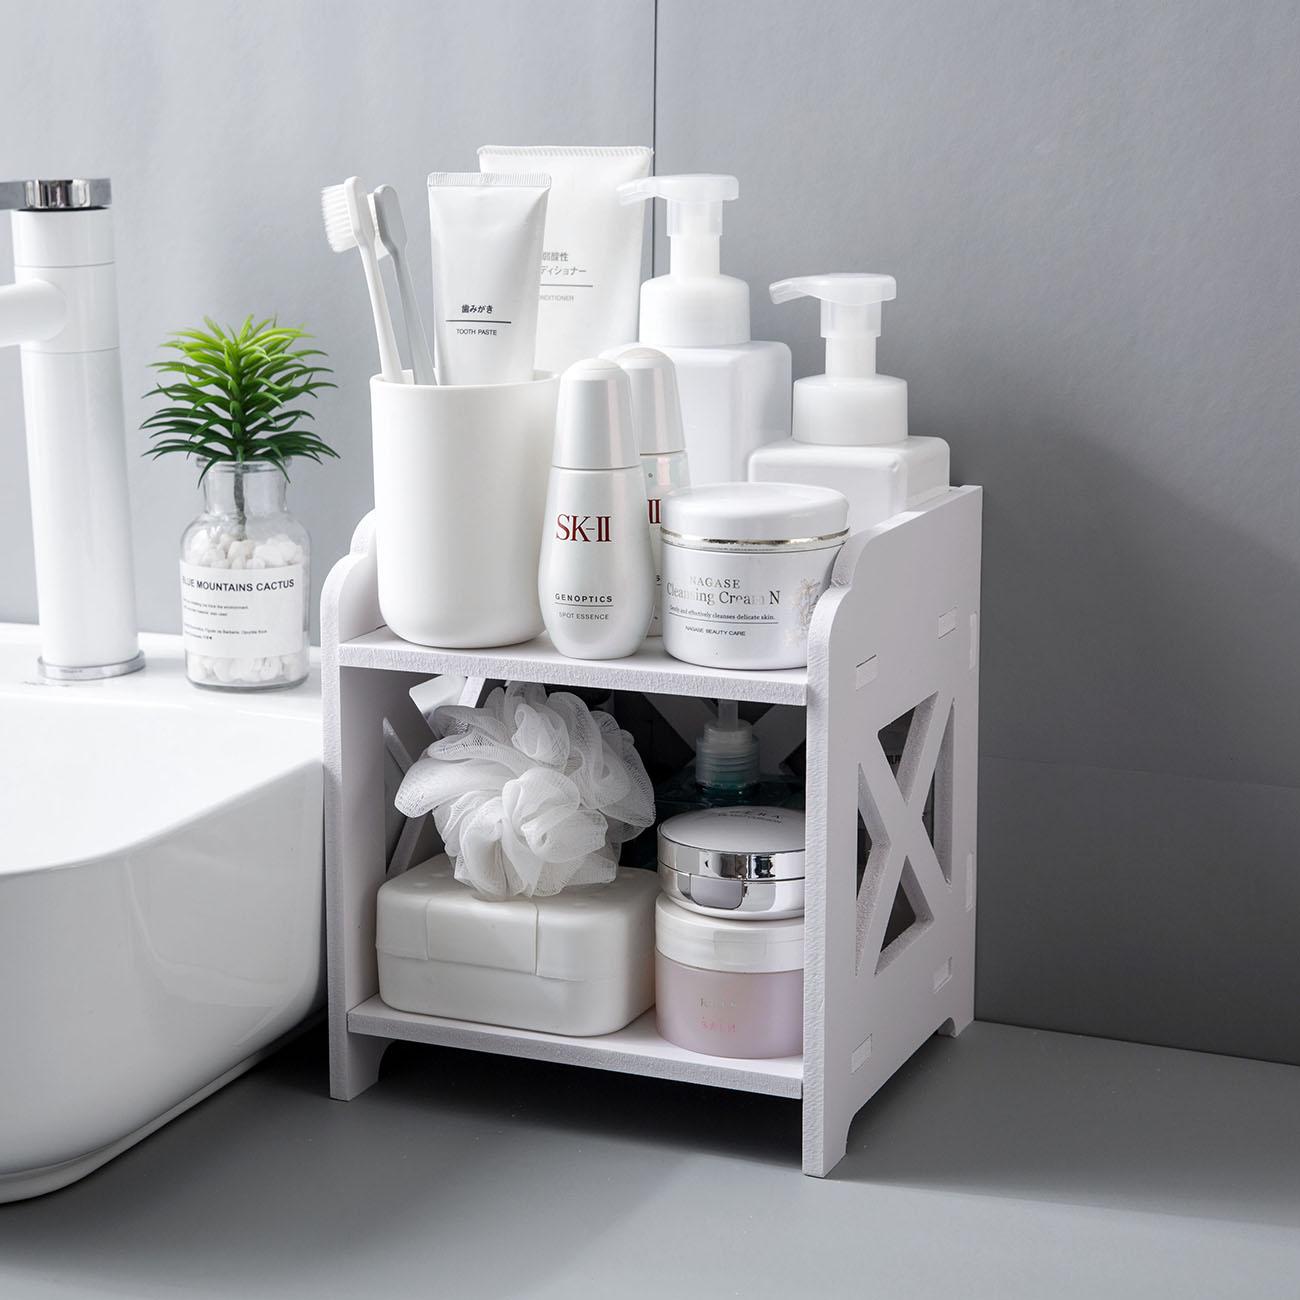 OTHERHOUSE Wood Desktop Shelf Bathroom Storage Rack Shelves Makeup Organizer Table Sundries Holder Kitchen Spice Rack Organizer